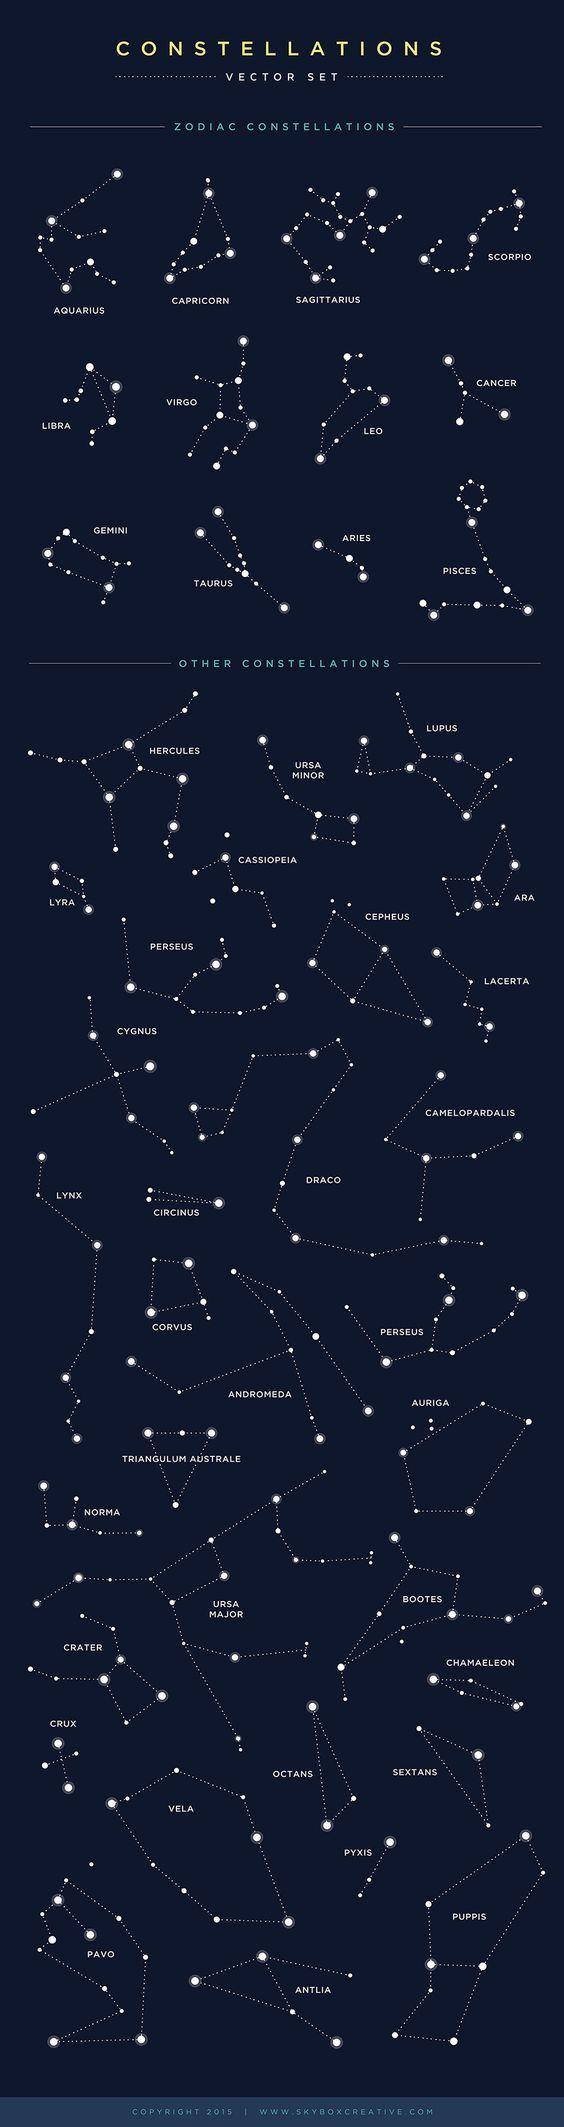 Constellations Vector Set - https://www.designcuts.com/product/constellations-vector-set-30-off-intro-special/